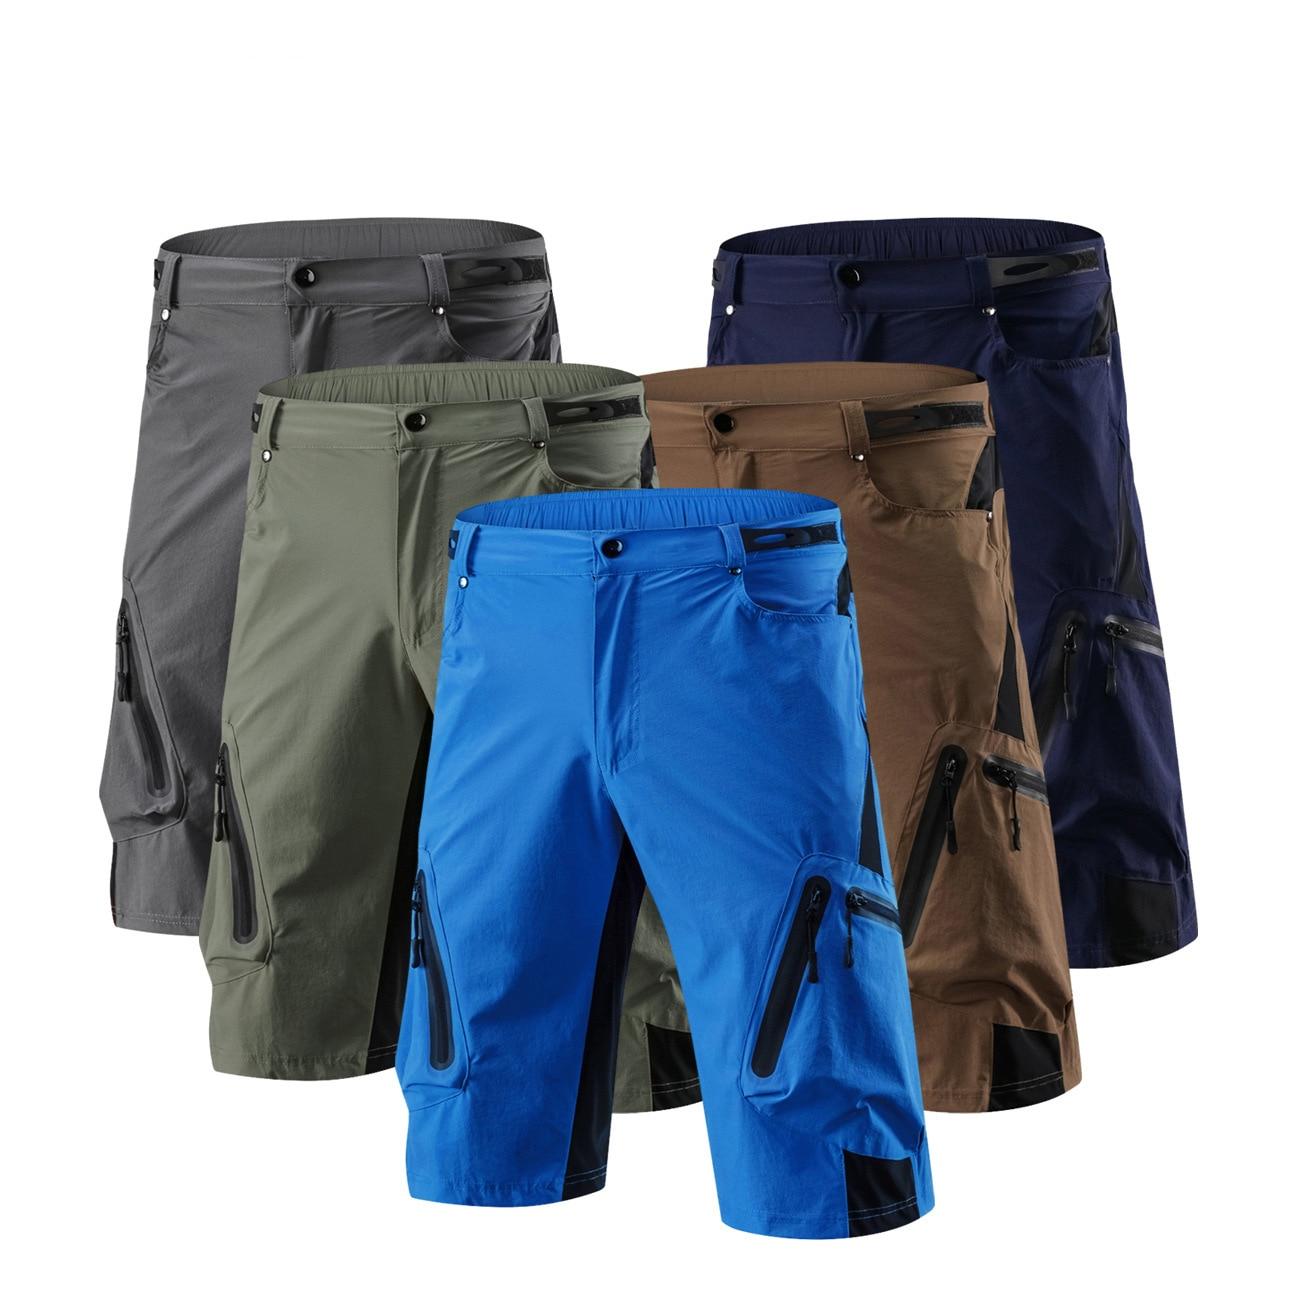 Men's Sports Cycling Shorts Downhill MTB Mountain Bike Bicycle Shorts Breathable M-4XL Mountain Bike Hiking Short Trousers